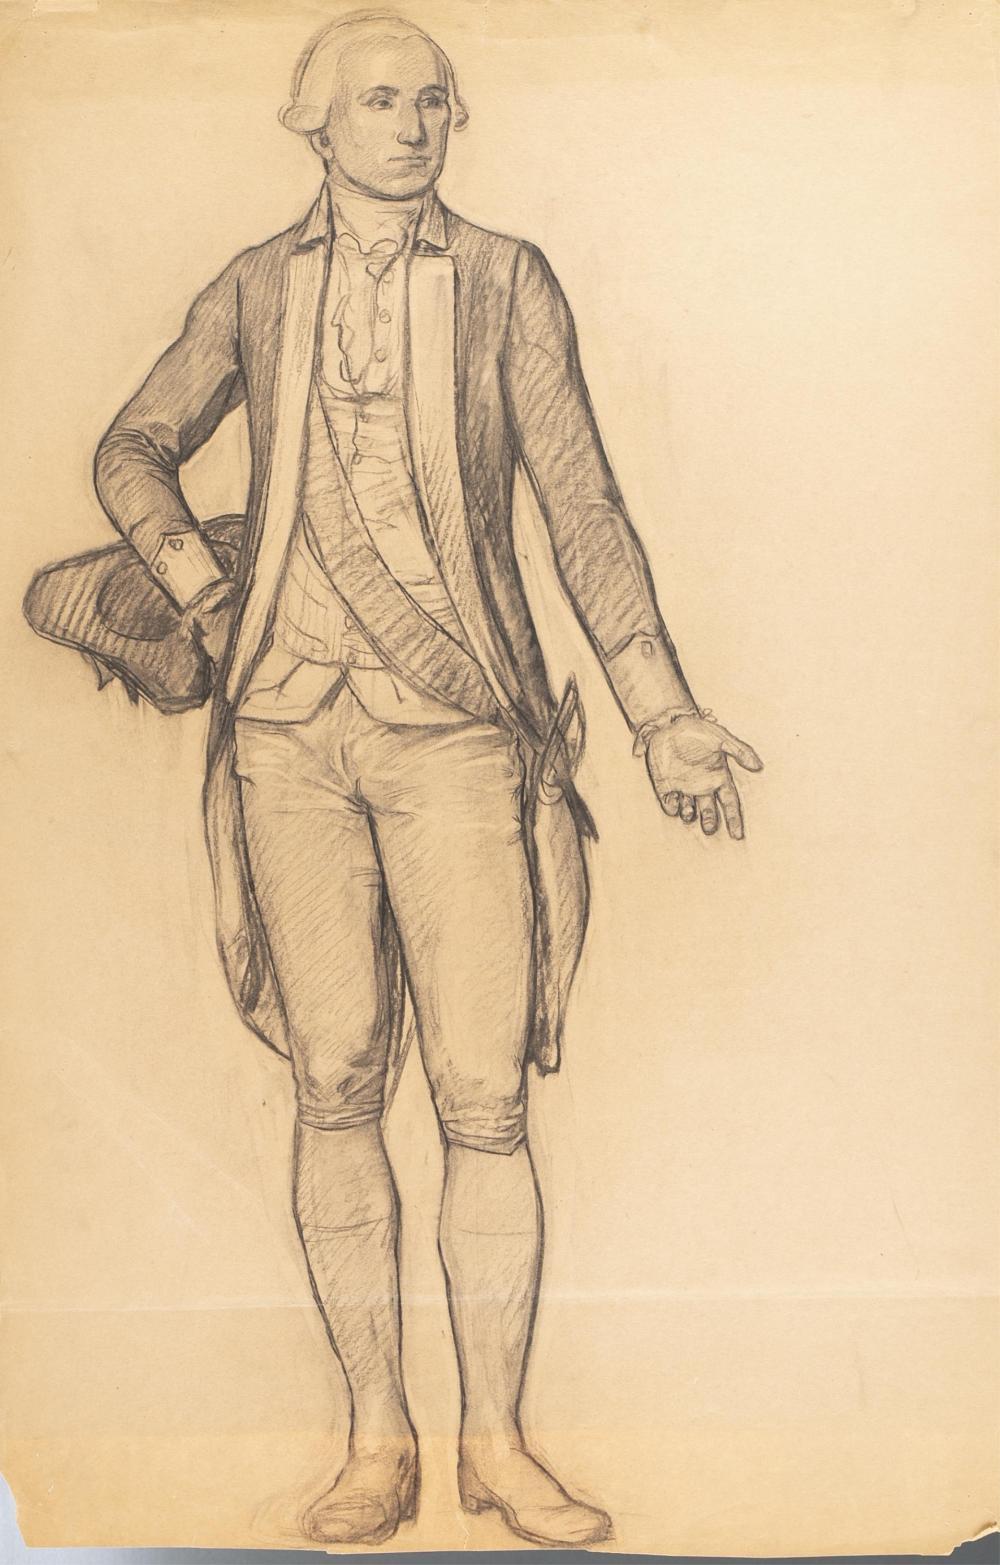 Lot 267: Cox. U.S. Capitol. George Washington Sketches.